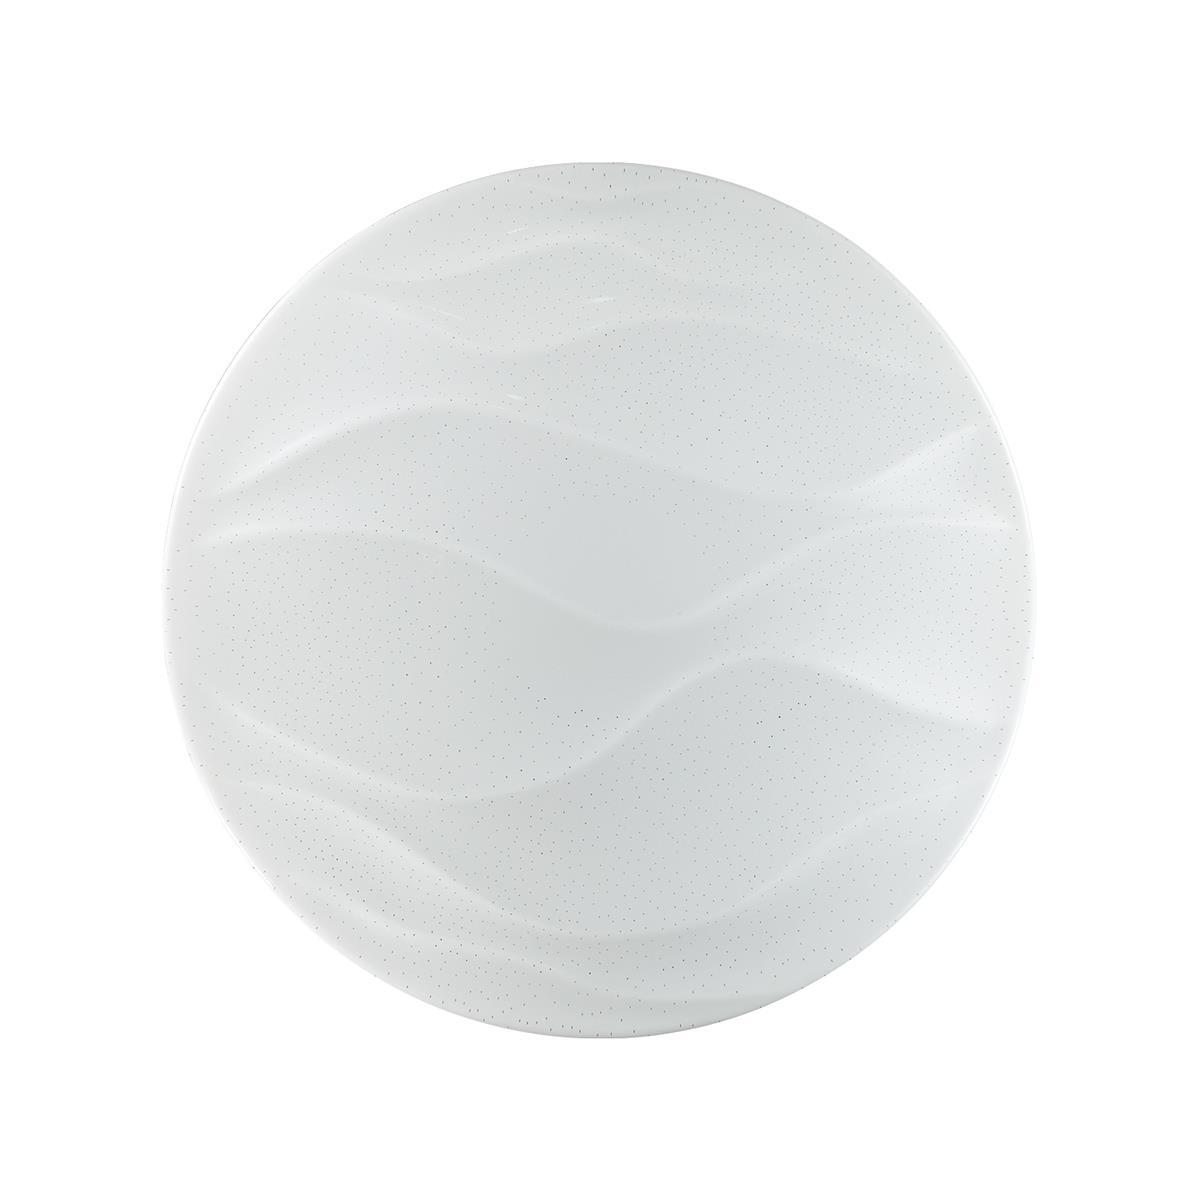 Sonex 2090/ML